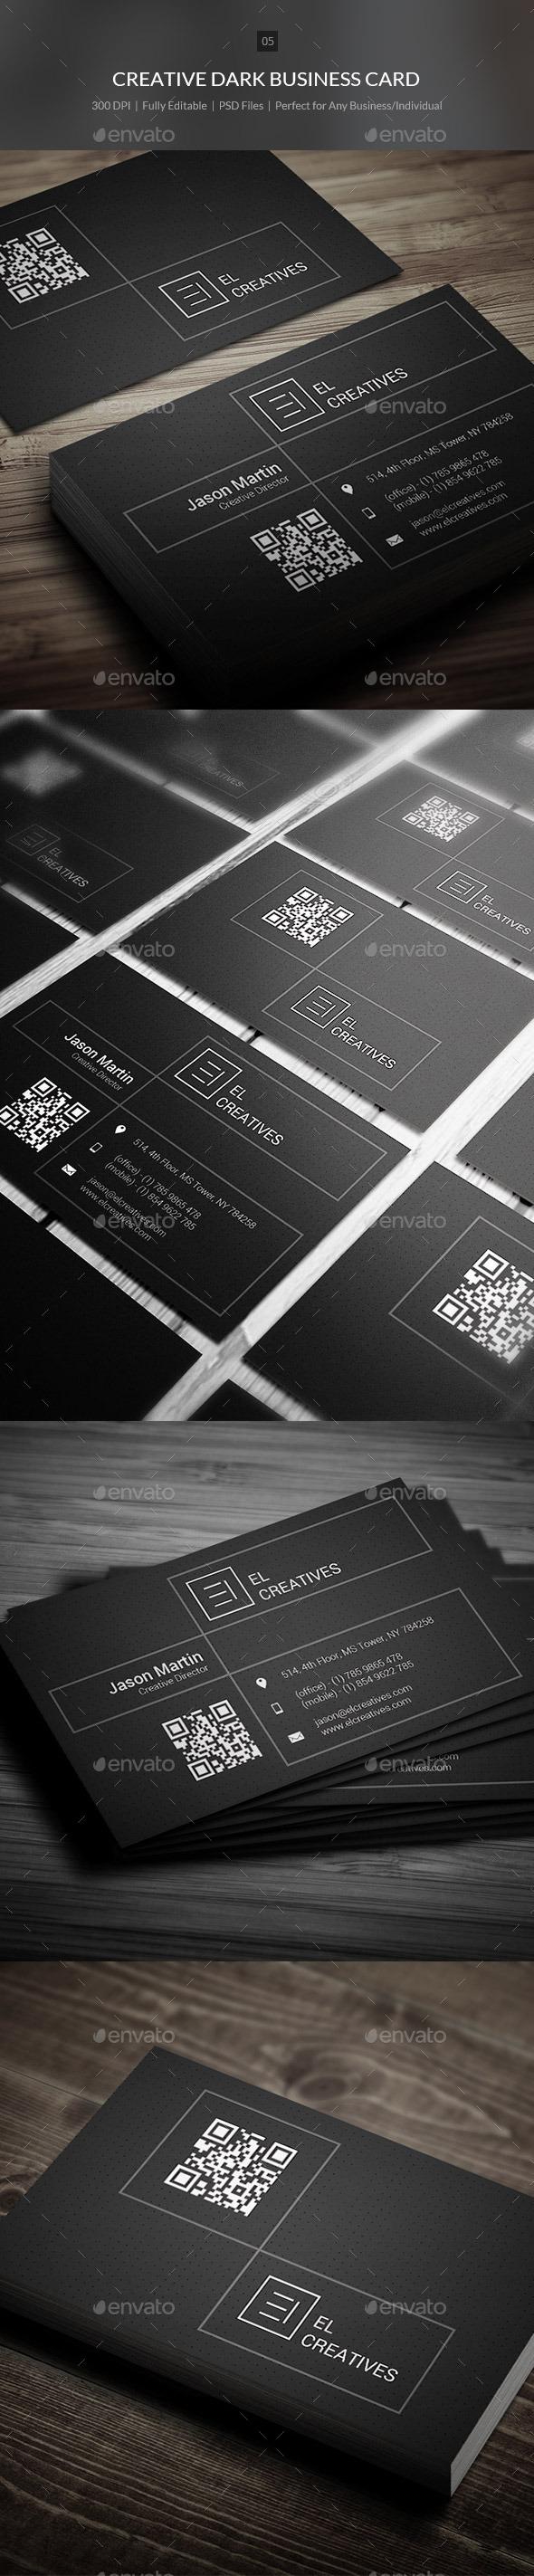 Creative Dark Business Card - 05 - Creative Business Cards